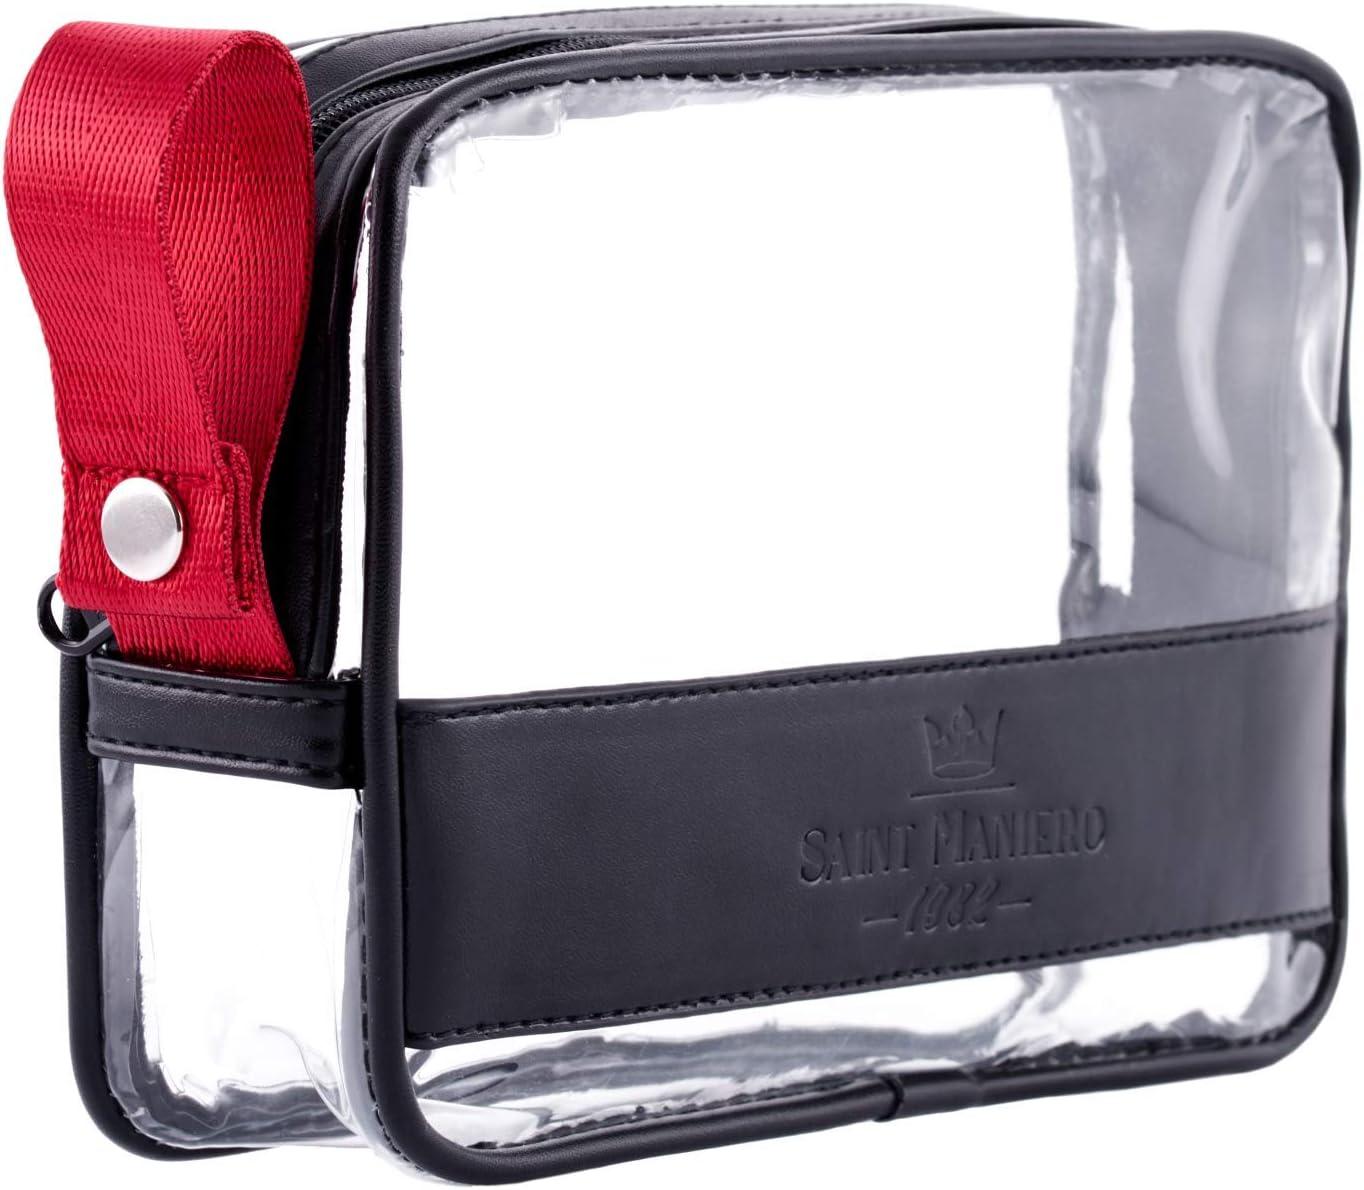 Saint Maniero Bolsa cosméticos Transparente I Neceser Transparente con Cremallera I Bolsa de Aseo 1 litro I Bolsa de Viaje Aprobado por la TSA I Organizador de Viaje Transparente